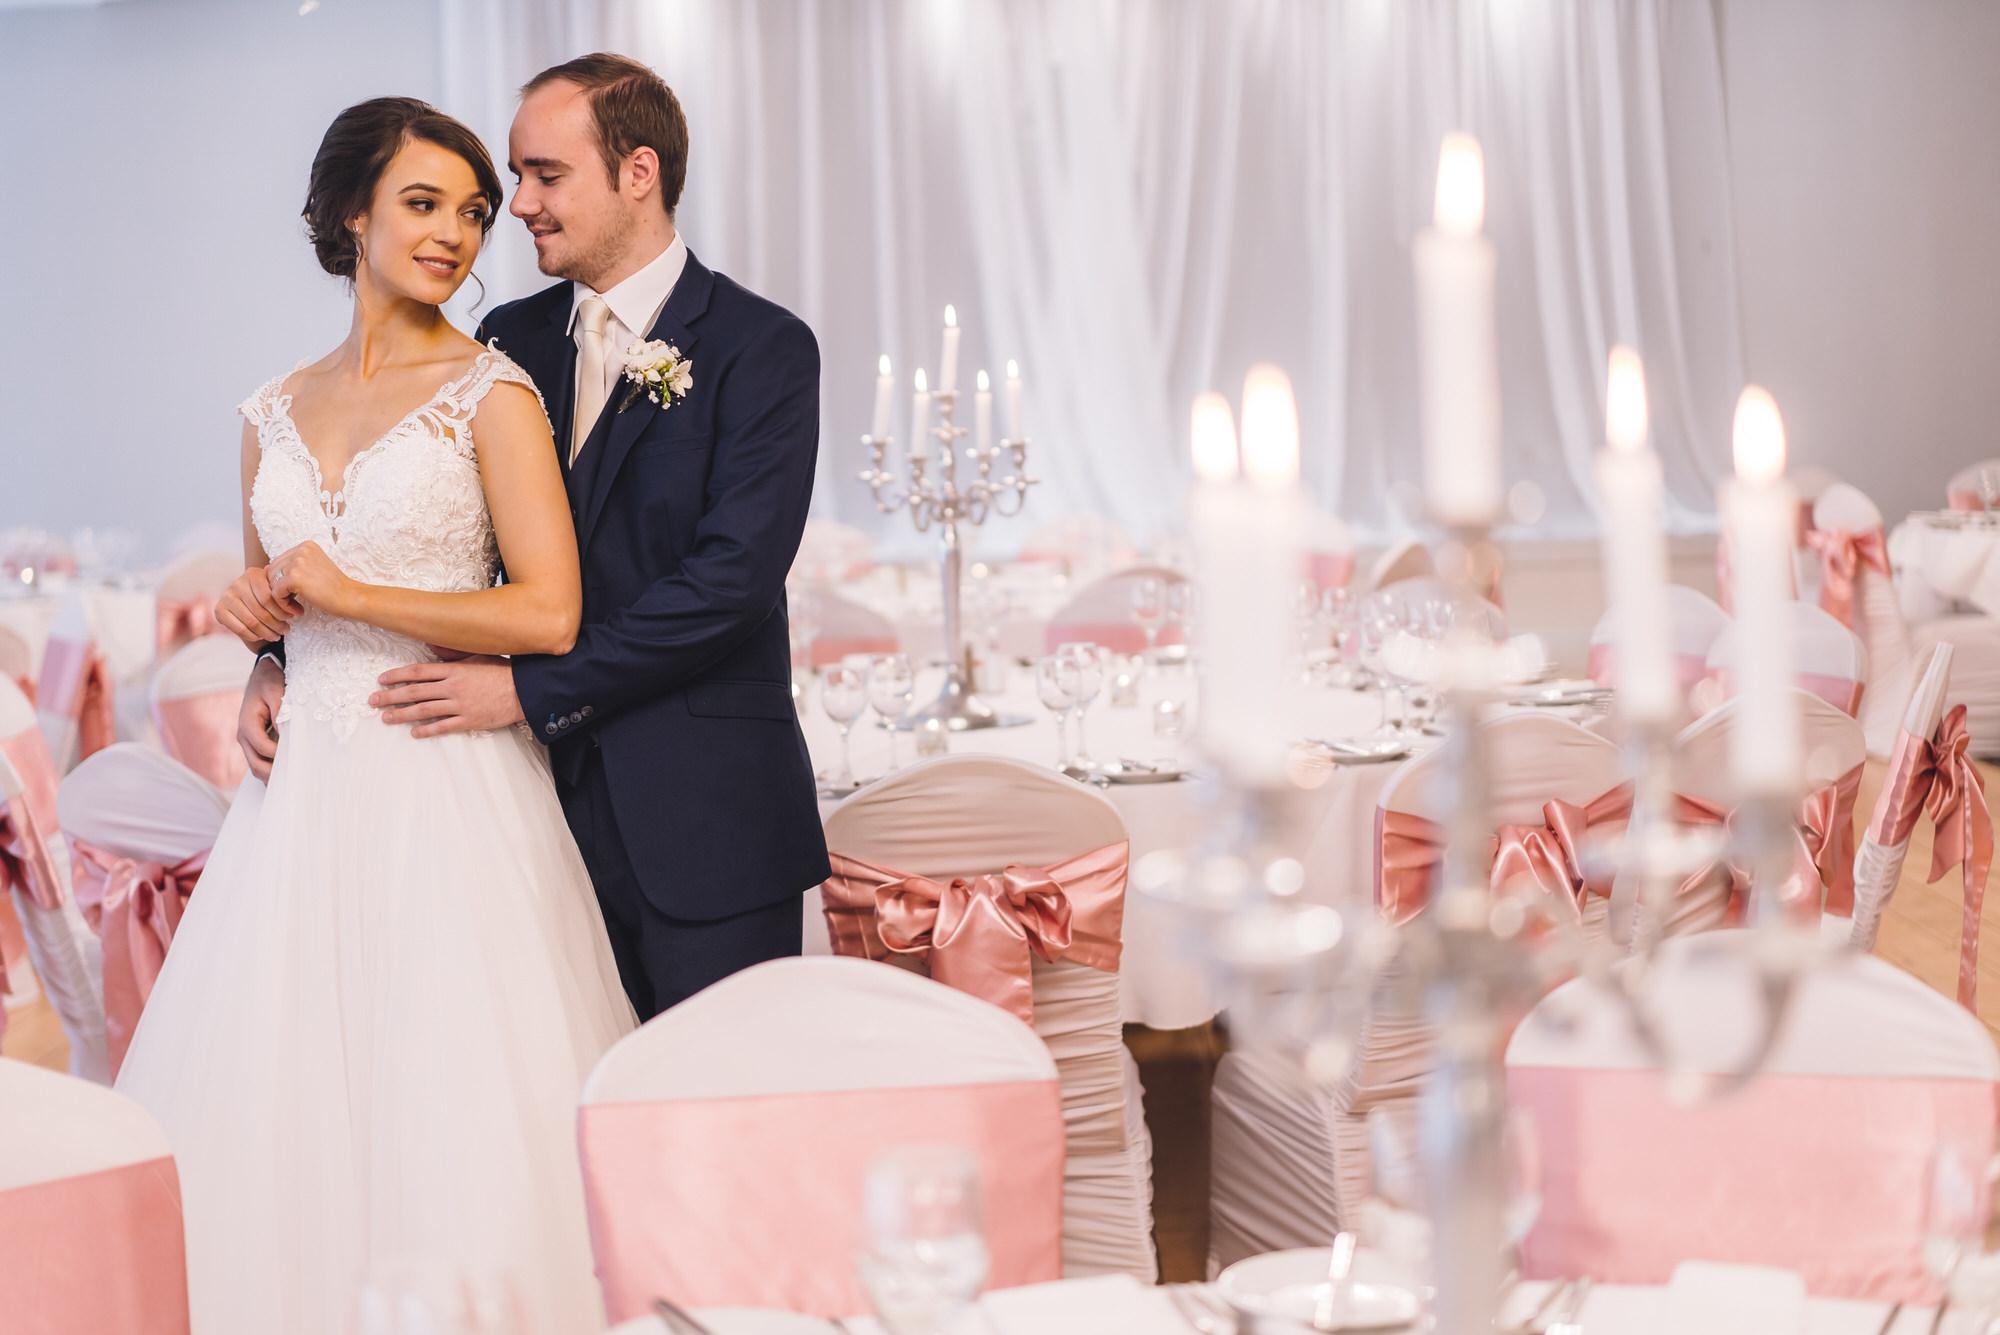 Roger-kenny-wedding-photographer-wicklow_123.jpg